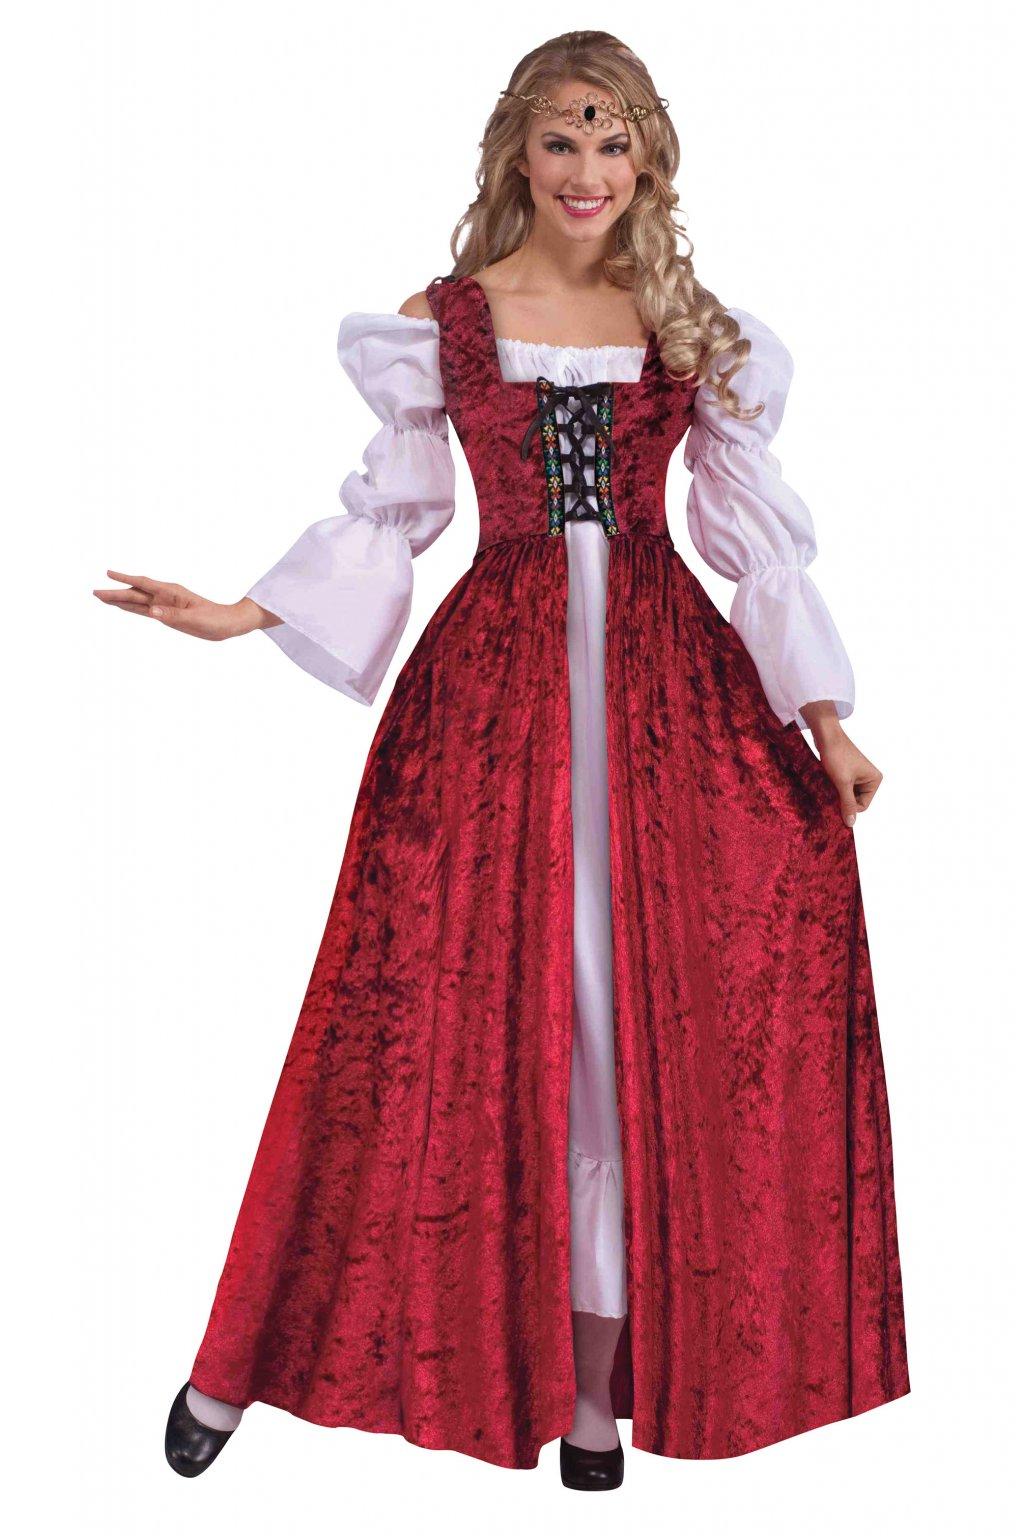 Princezna - dámský historický kostým